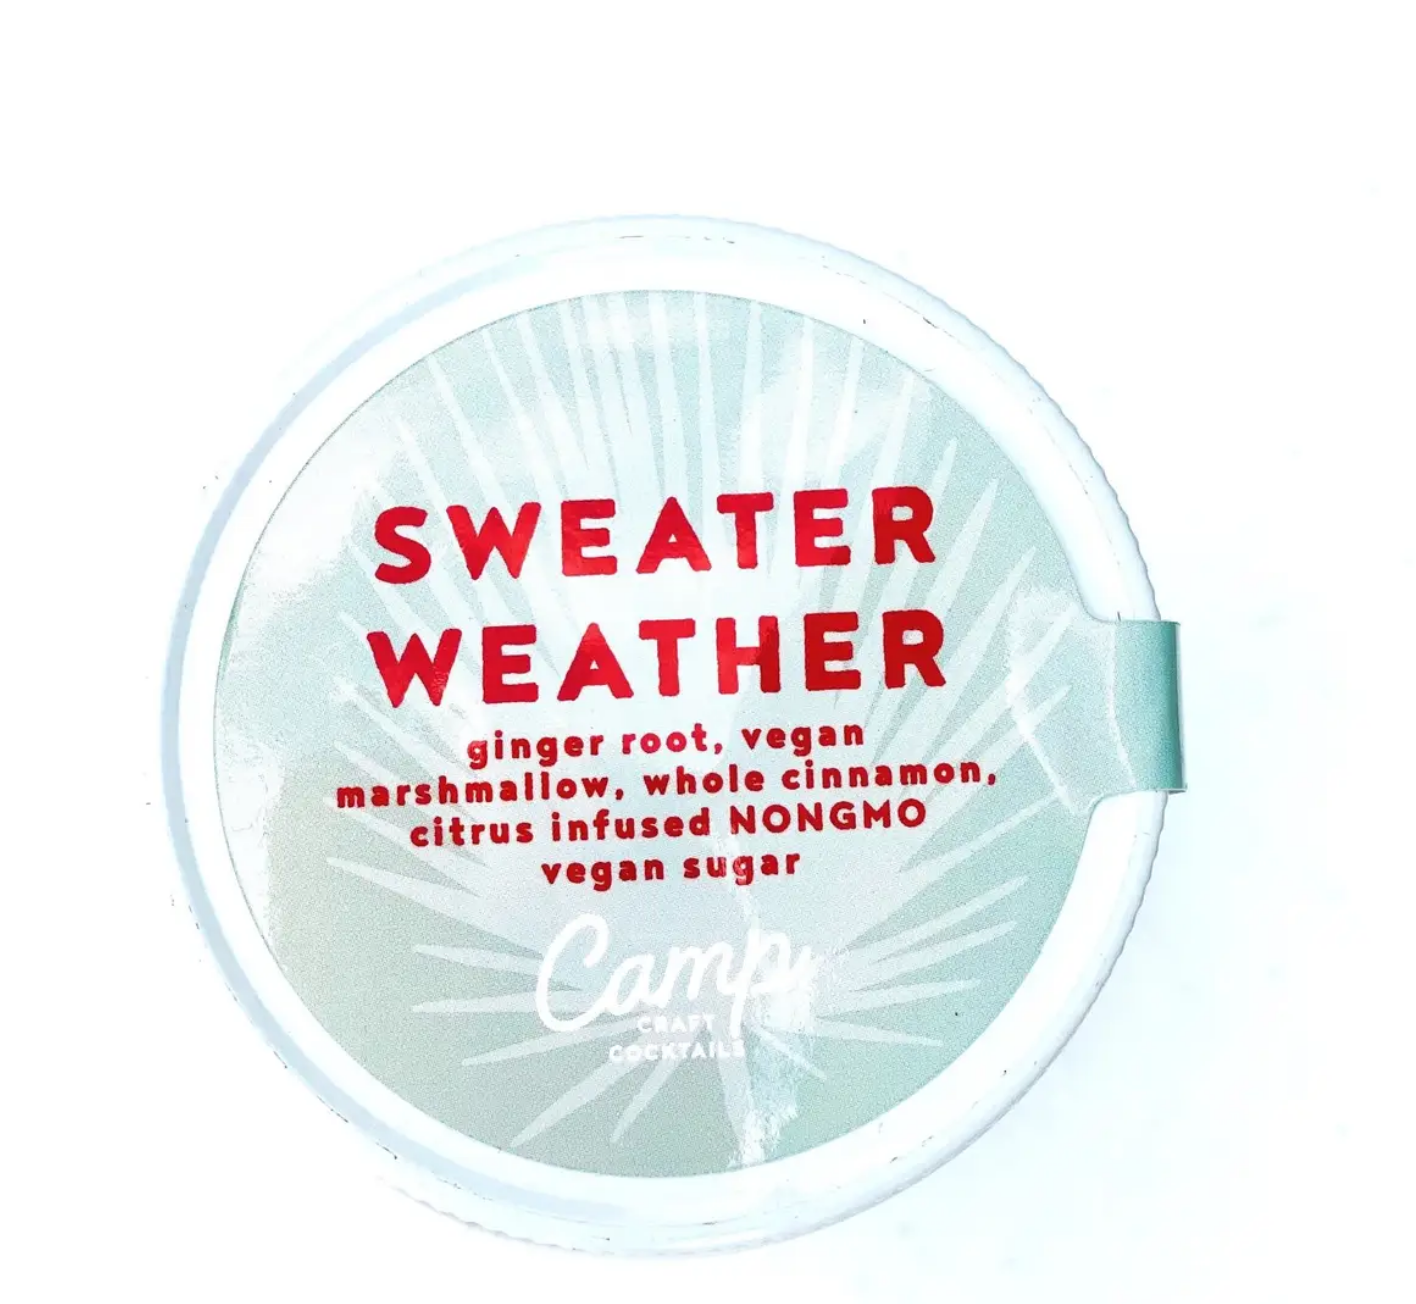 Camp Craft Cocktails Sweater Weather- 16oz